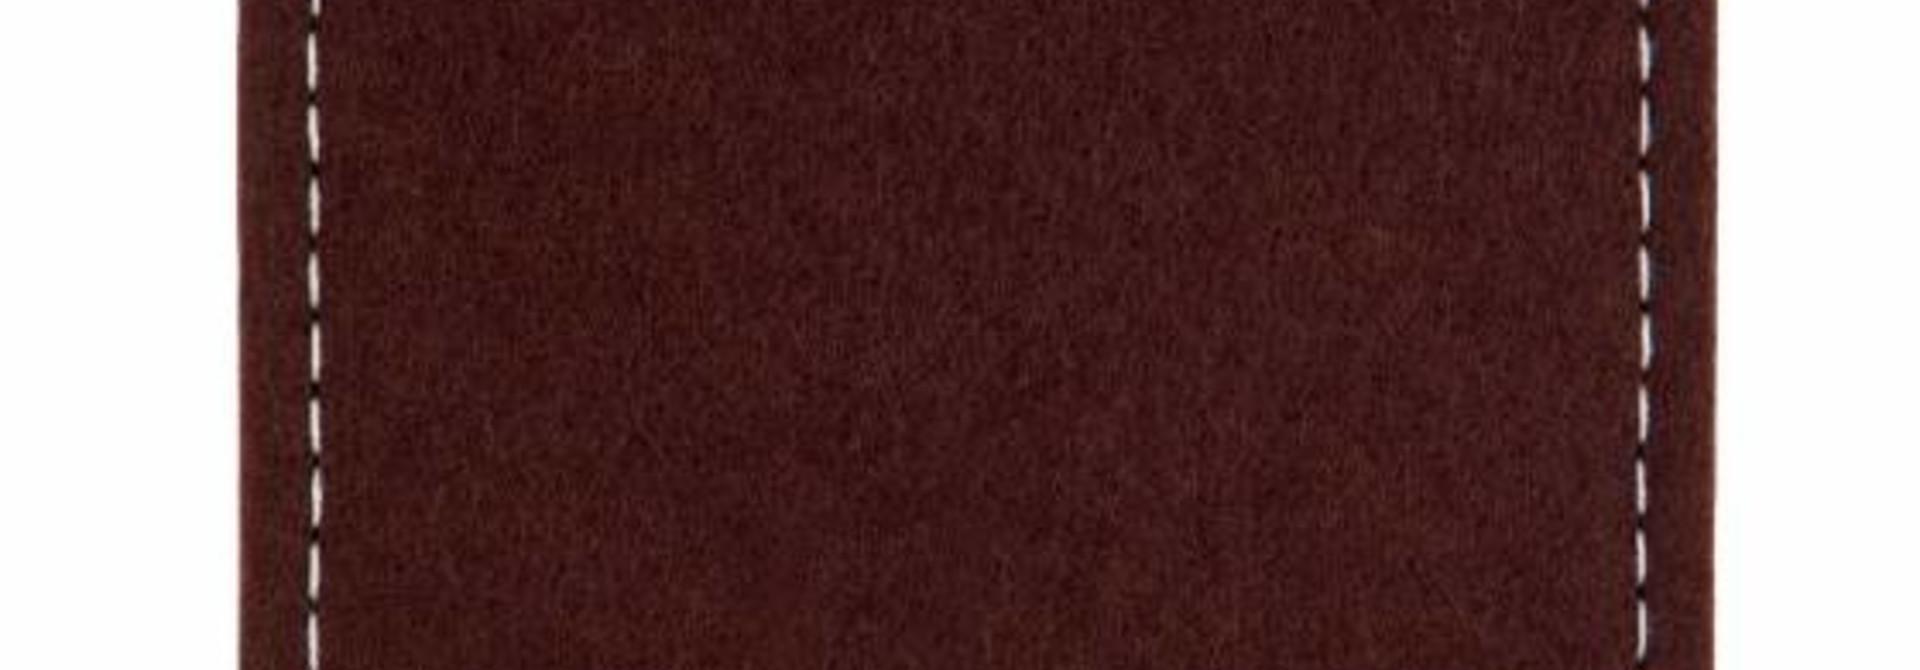 Mi / Redmi Sleeve Dunkelbraun